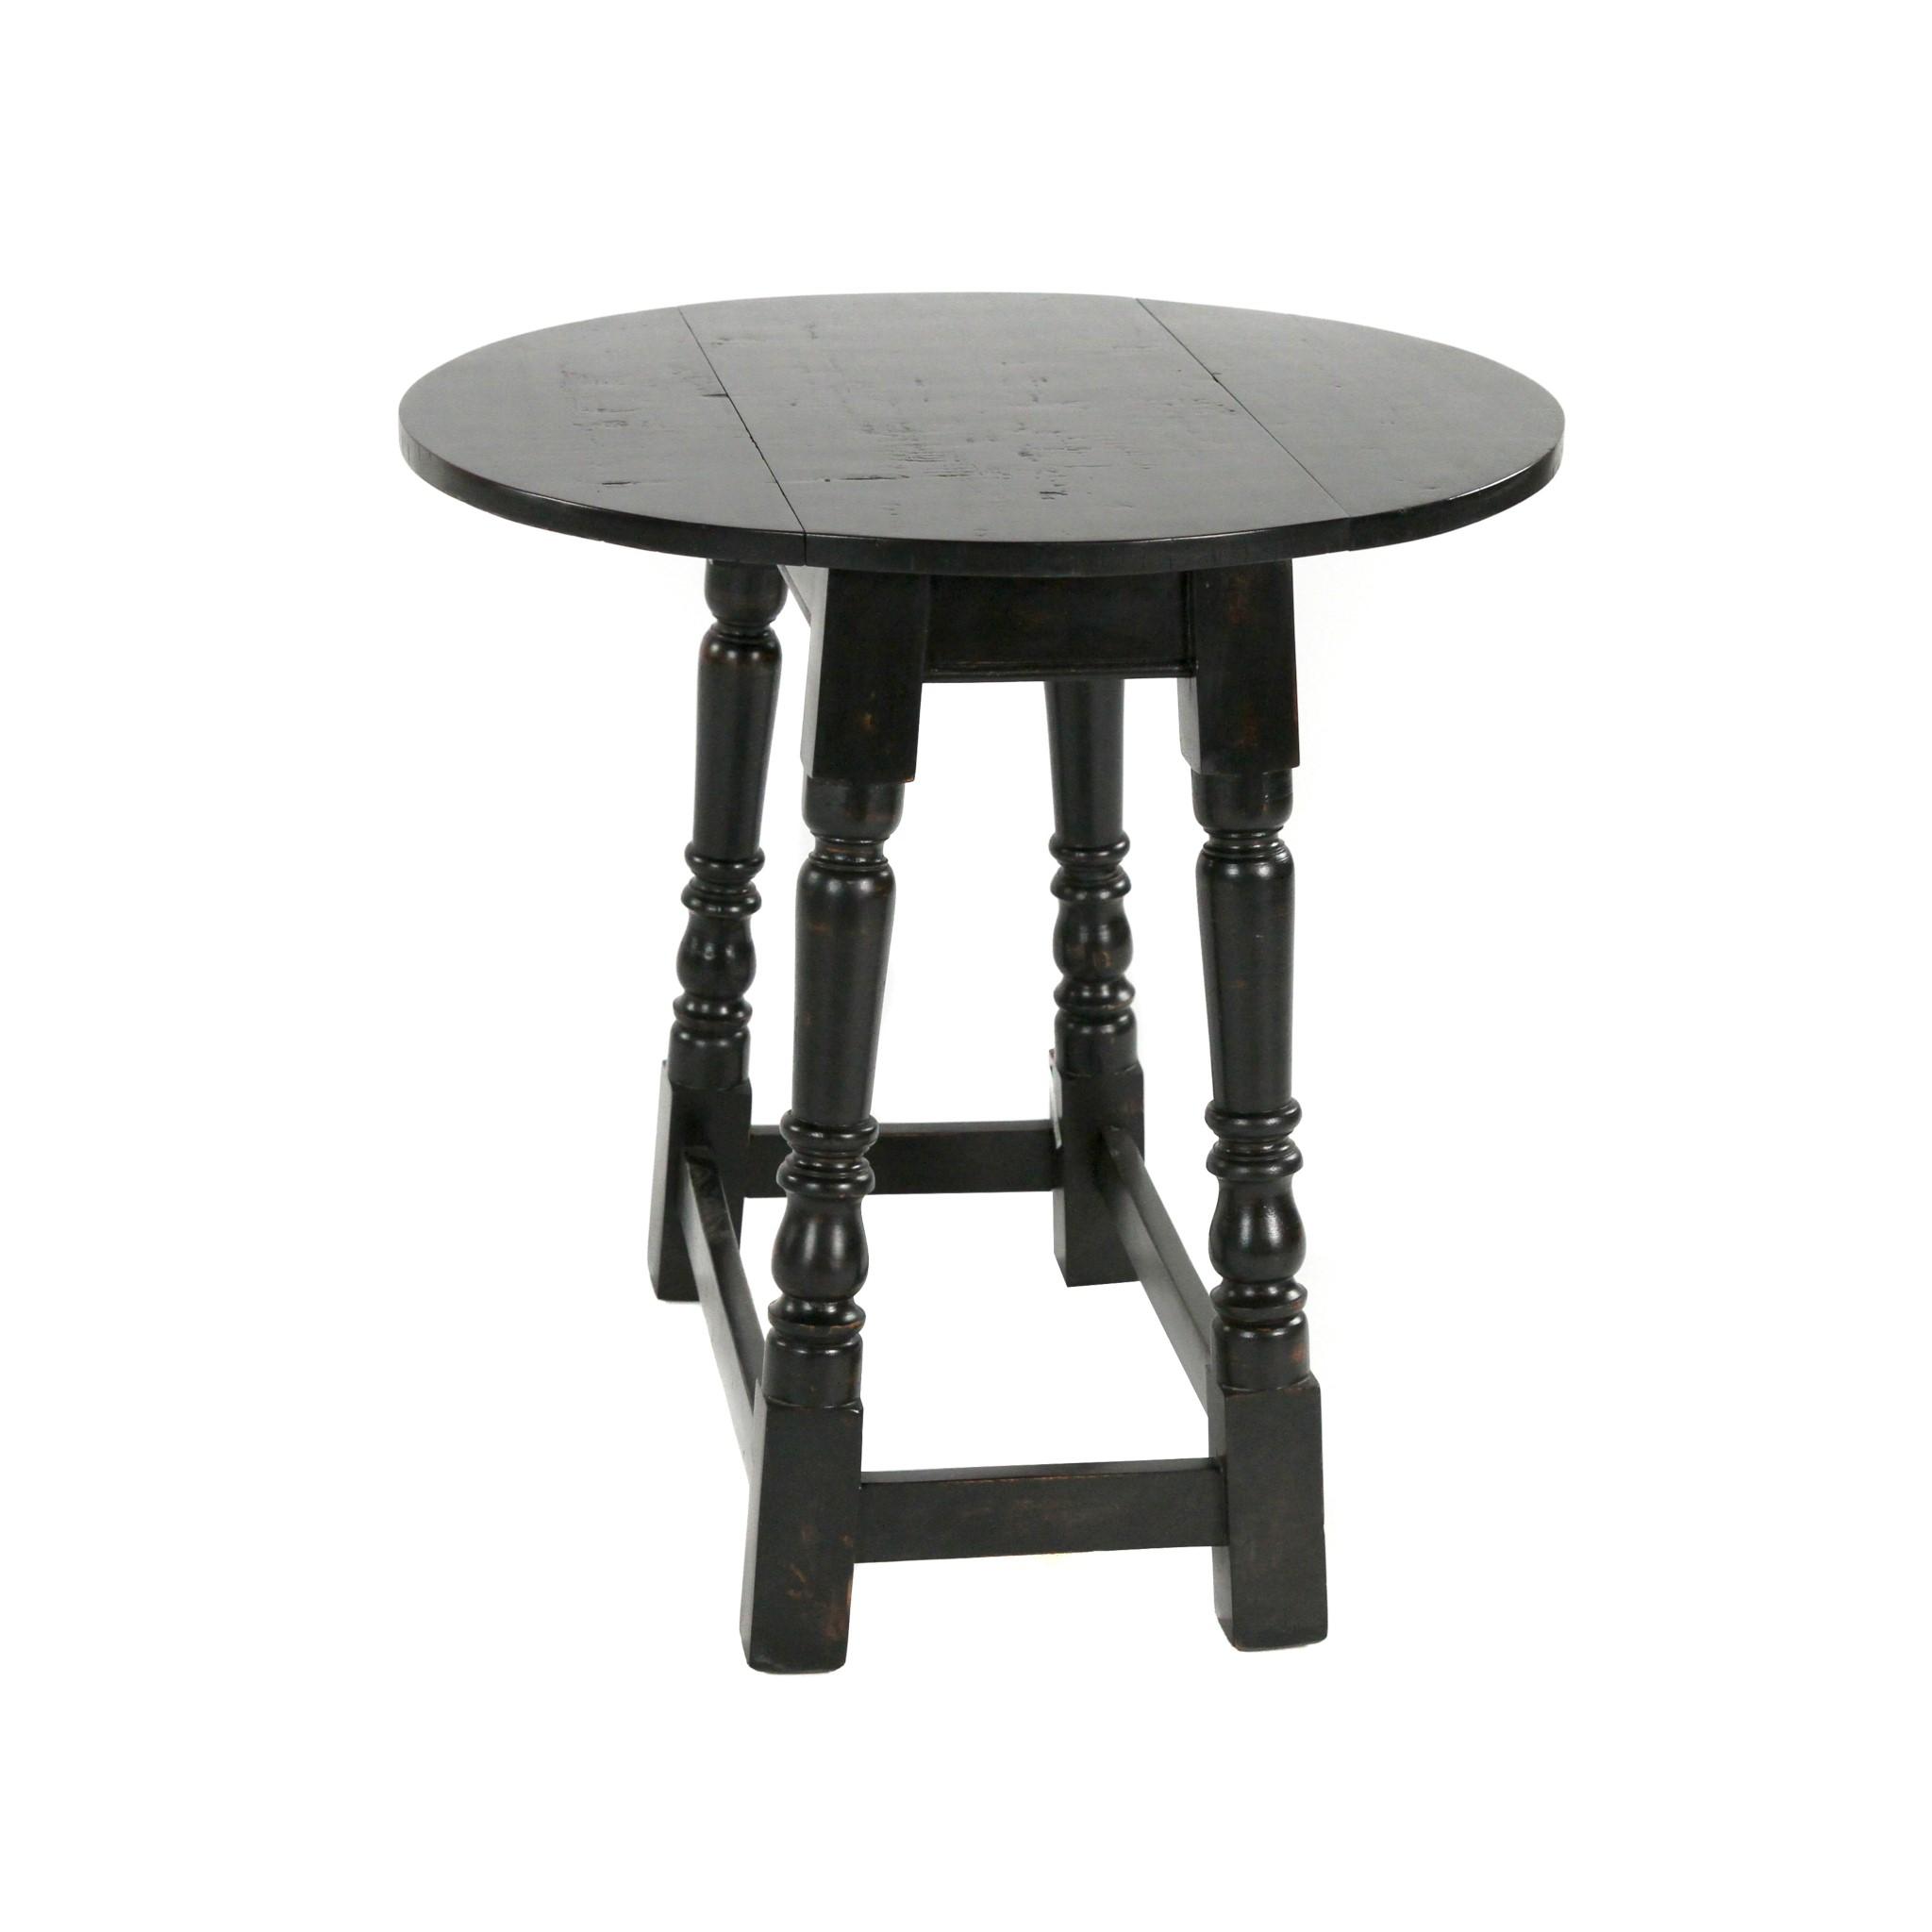 Drop-leaf Side Table 24x24x24 Black